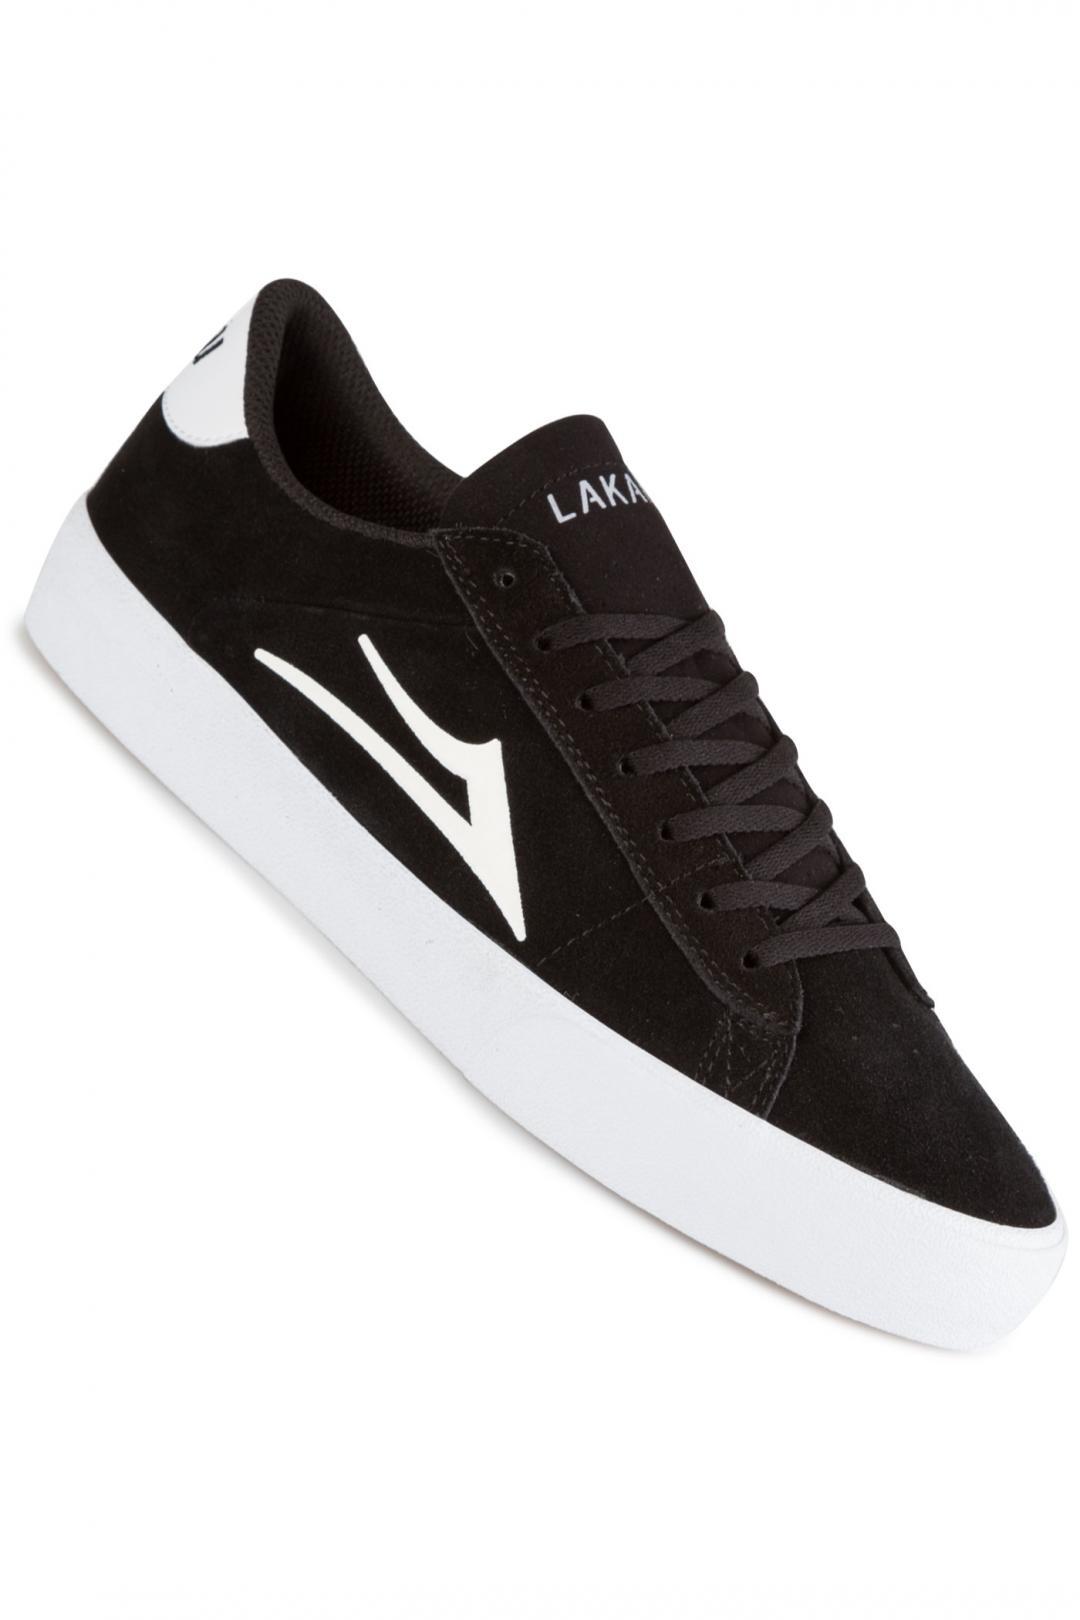 Uomo Lakai Newport Suede black white | Sneakers low top